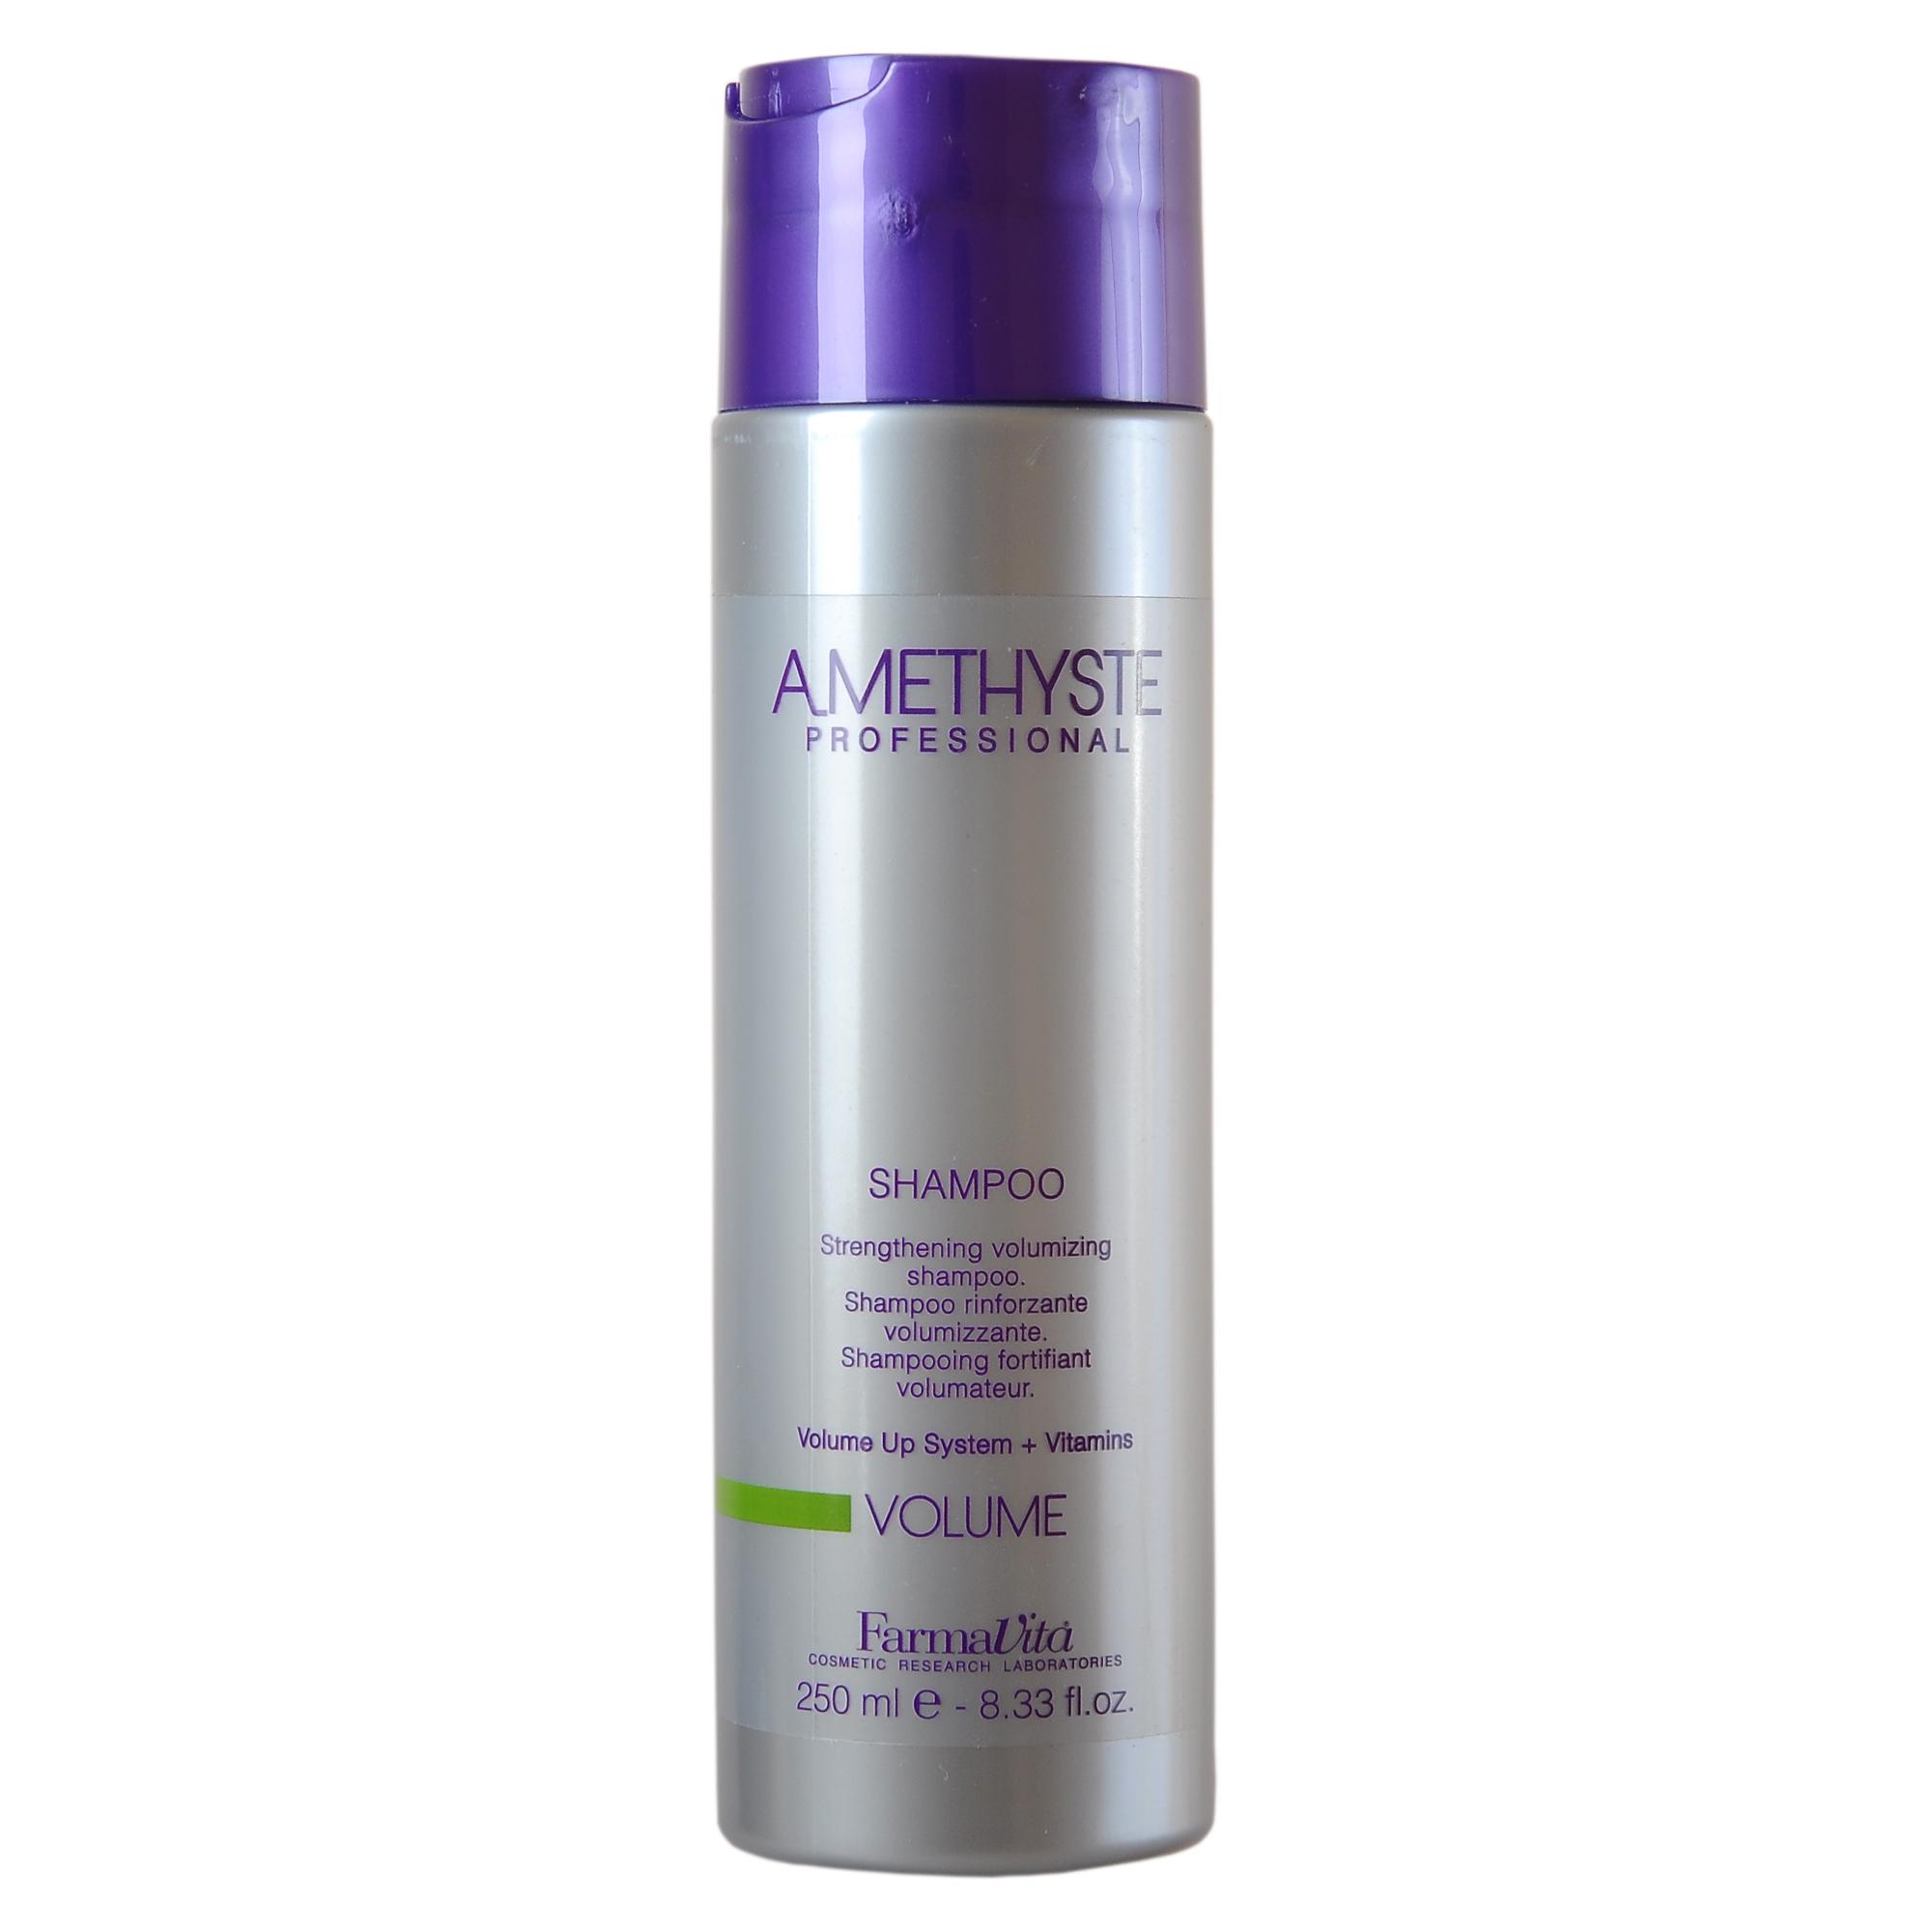 FARMAVITA Шампунь для объема / Amethyste volume shampoo 250мл недорого